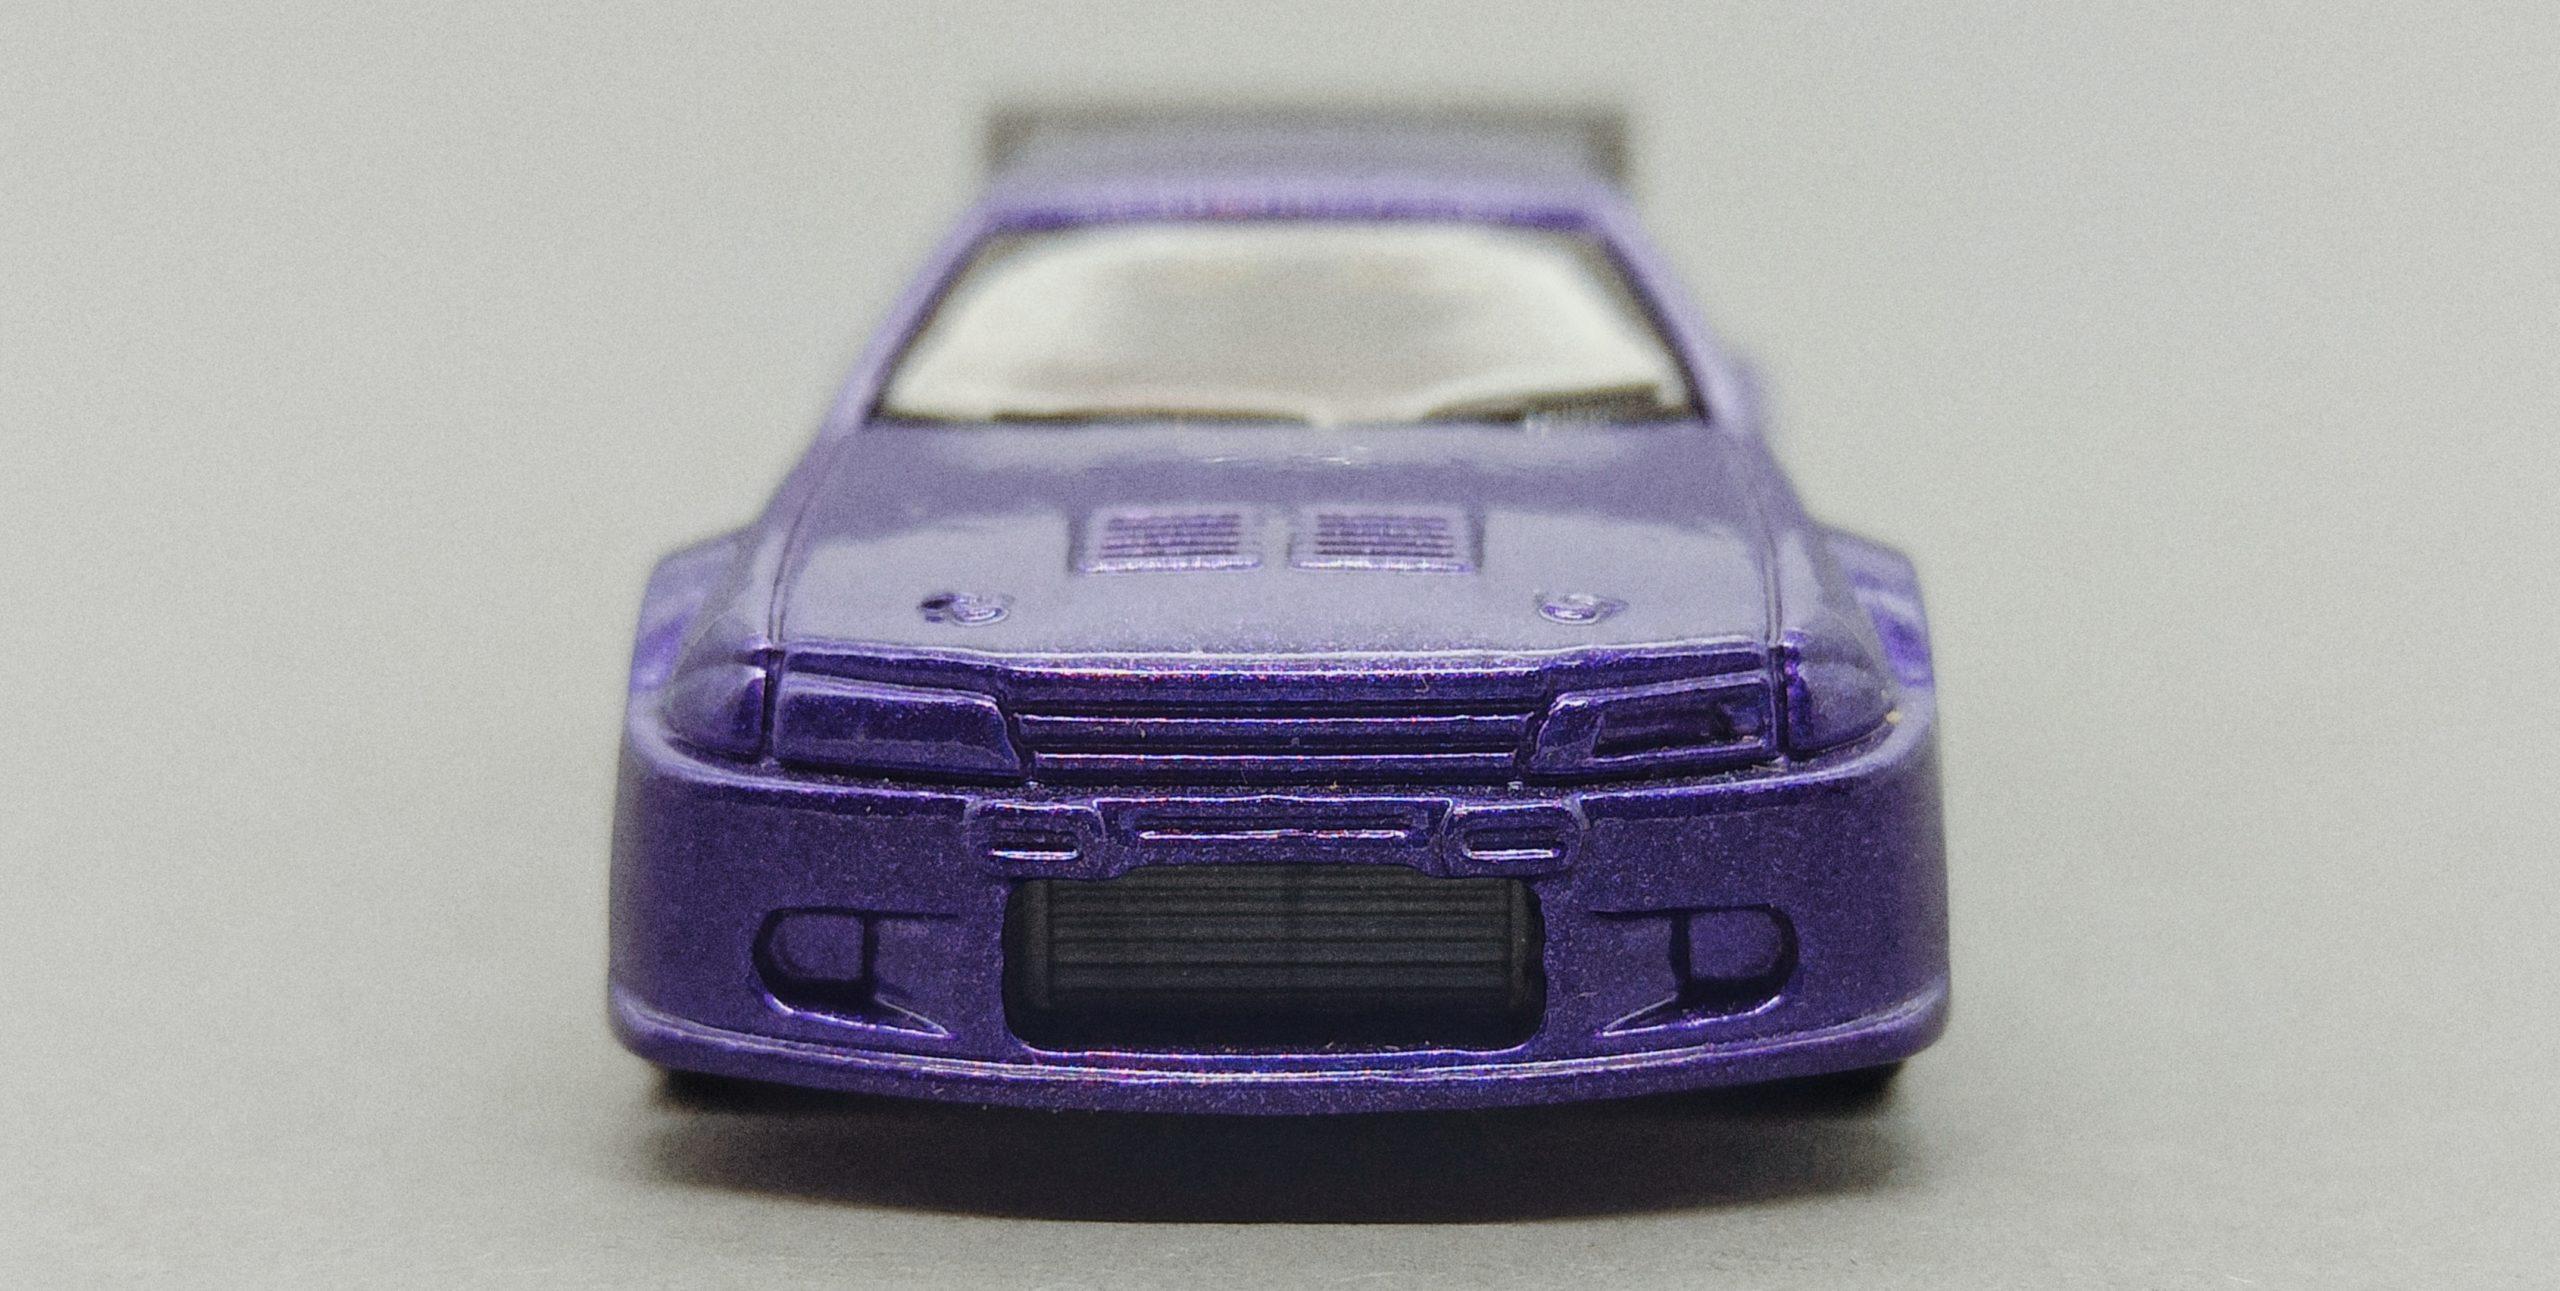 Hot Wheels Nissan Skyline (V0104) 2011 Racing Kits: Street Race (3/12) purple front